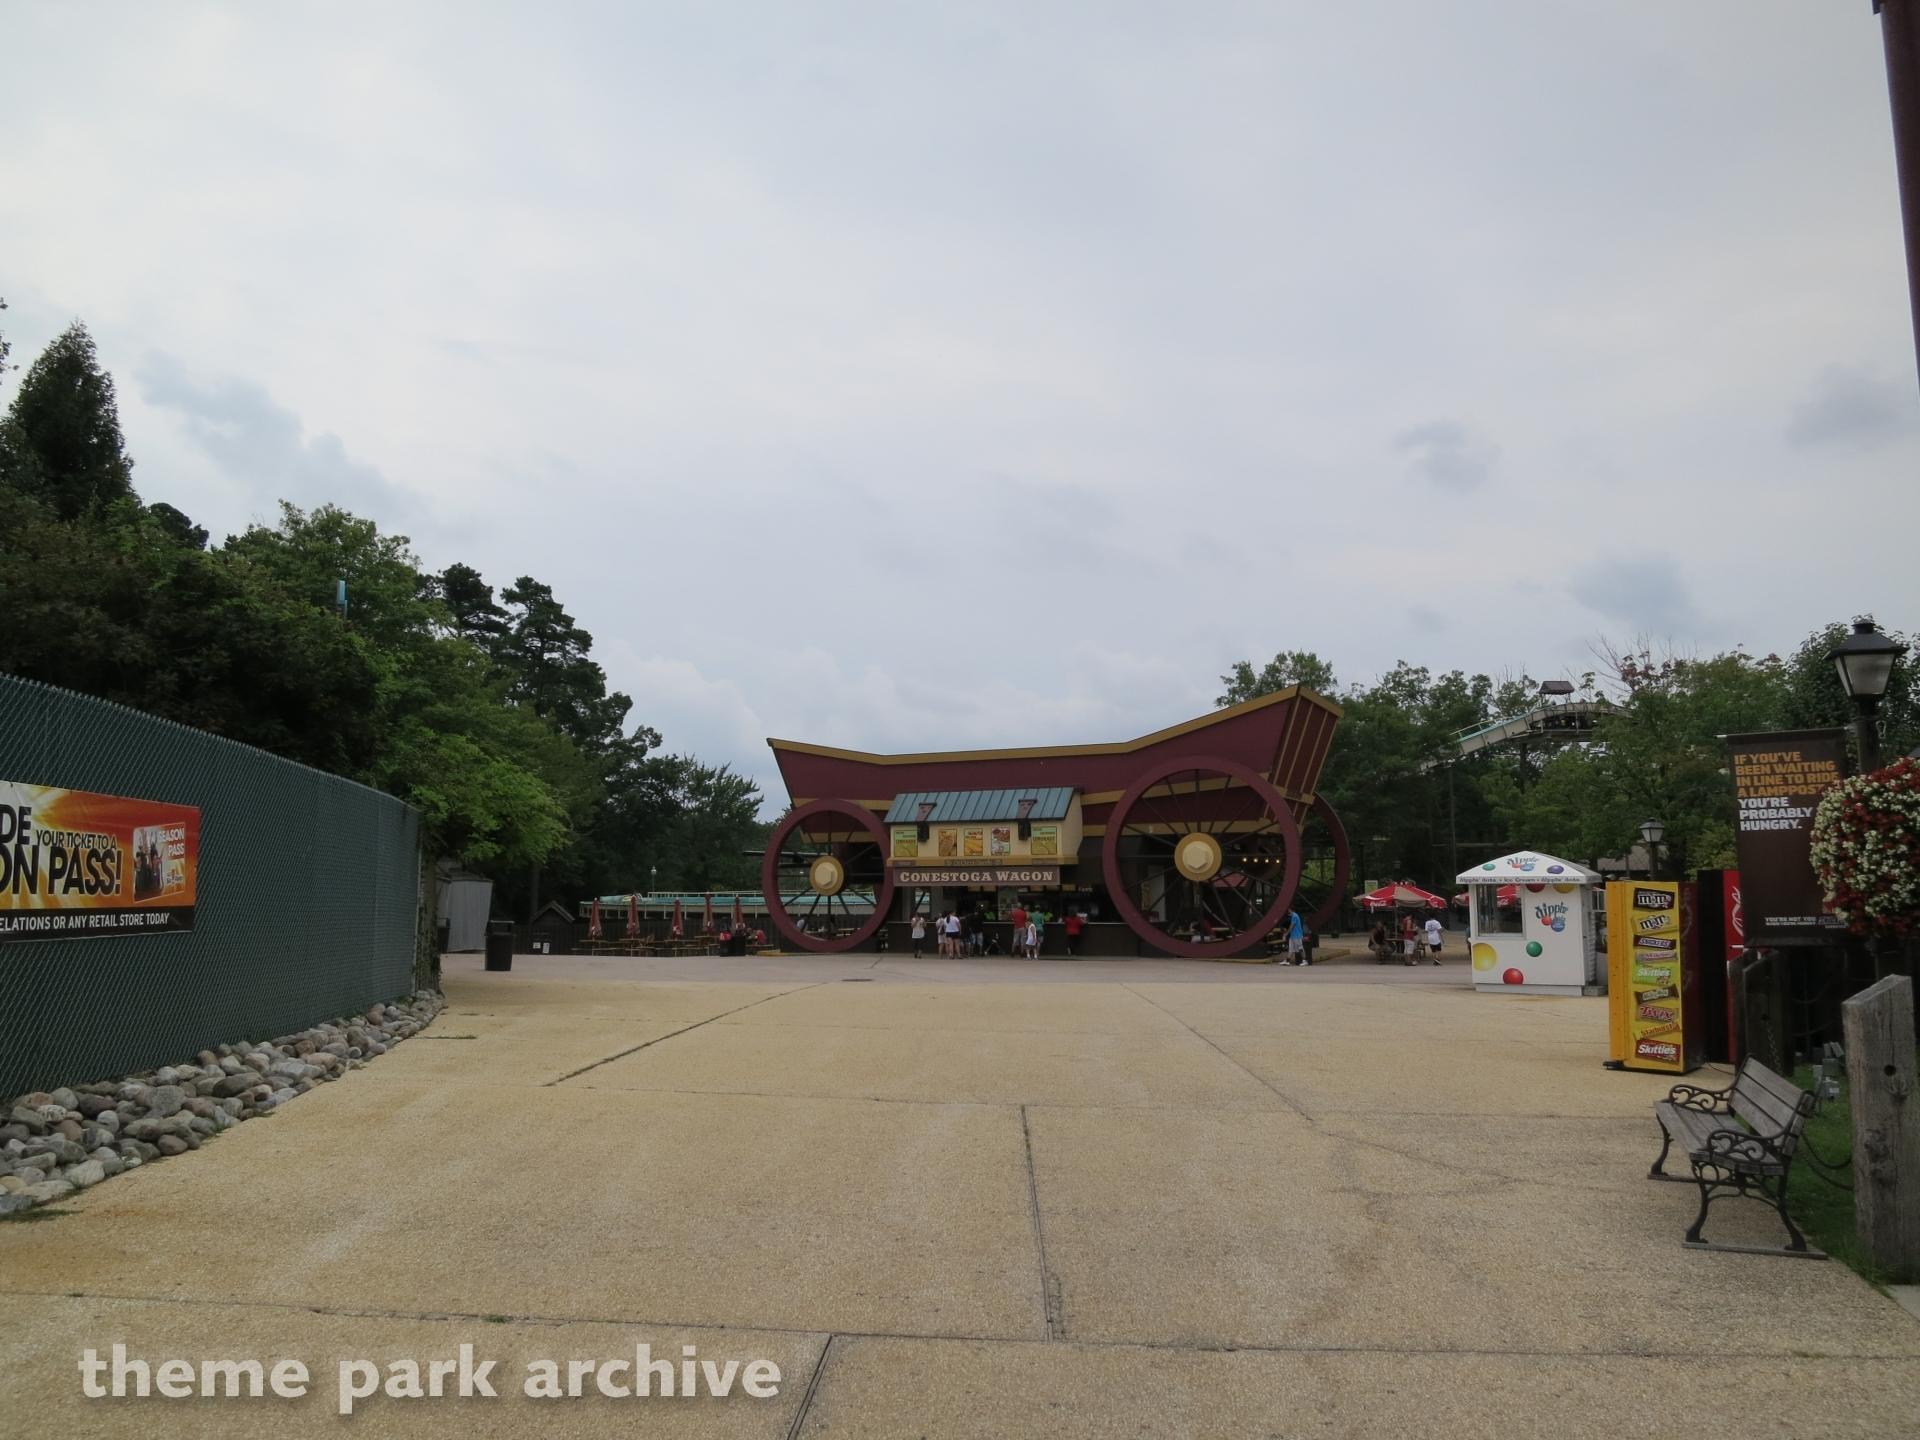 Frontier Adventures at Six Flags Great Adventure